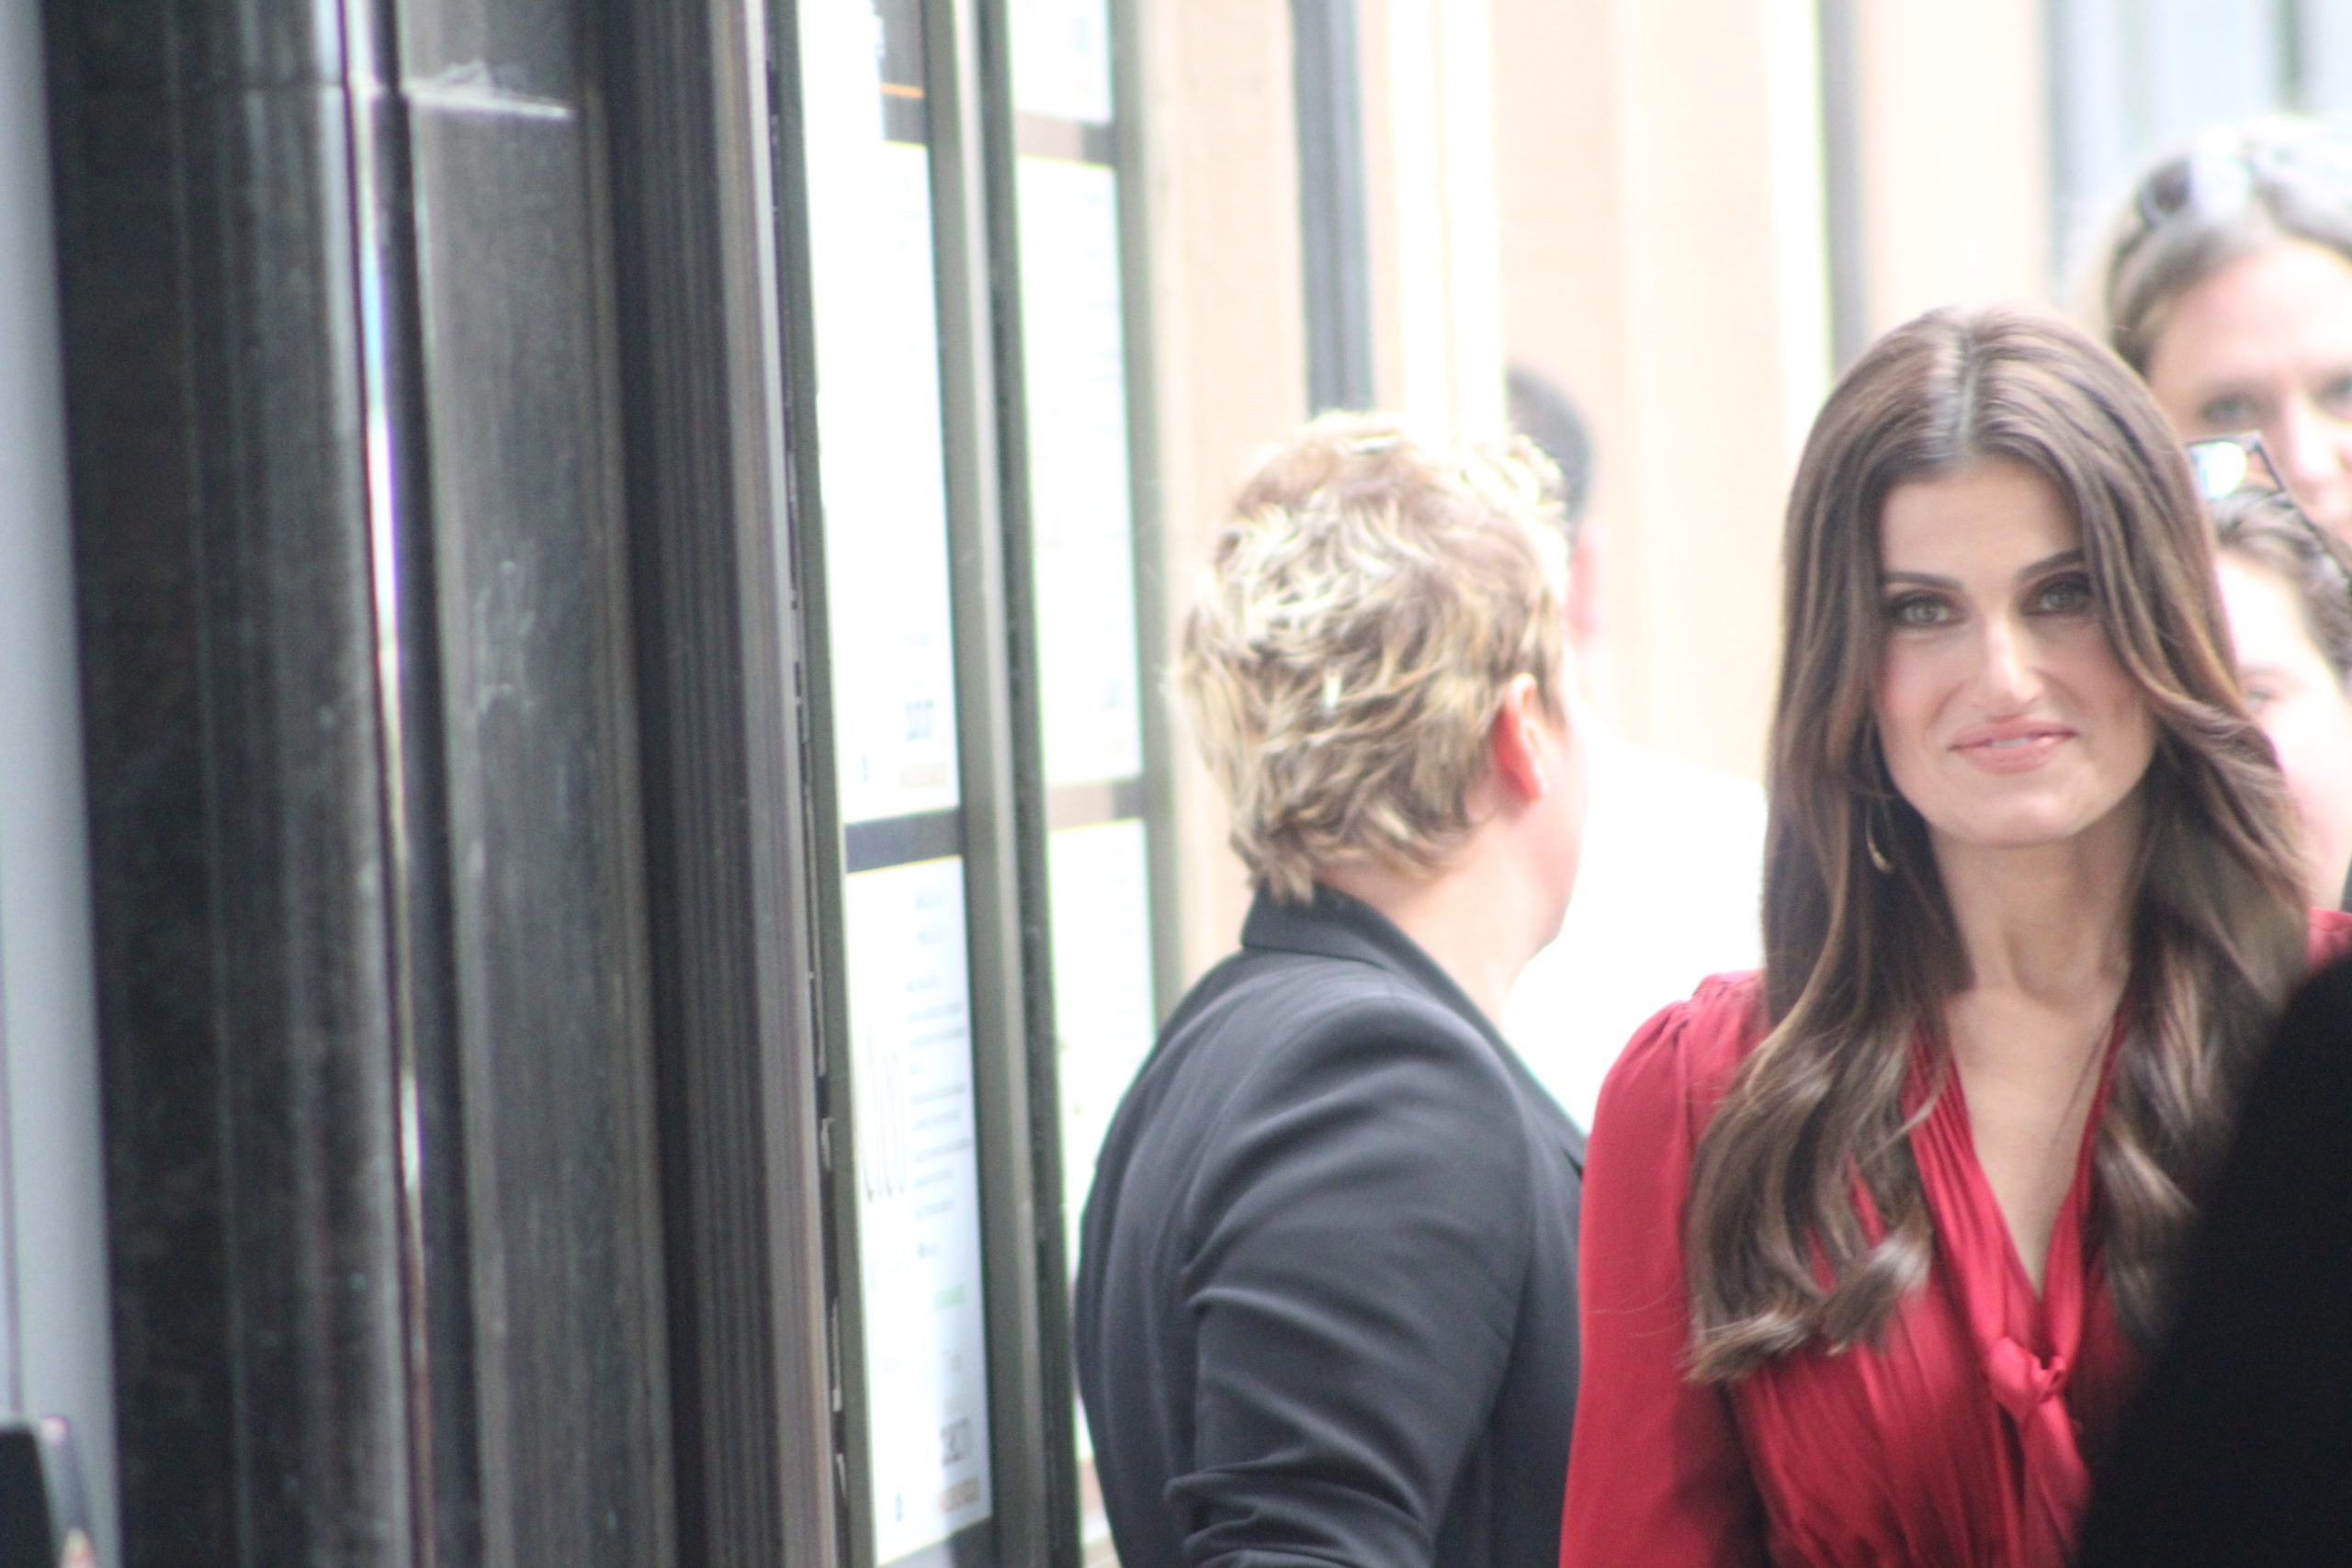 Idina Menzel Hollywood Walk of Fame. PHOTO: YEVETTE RENEE